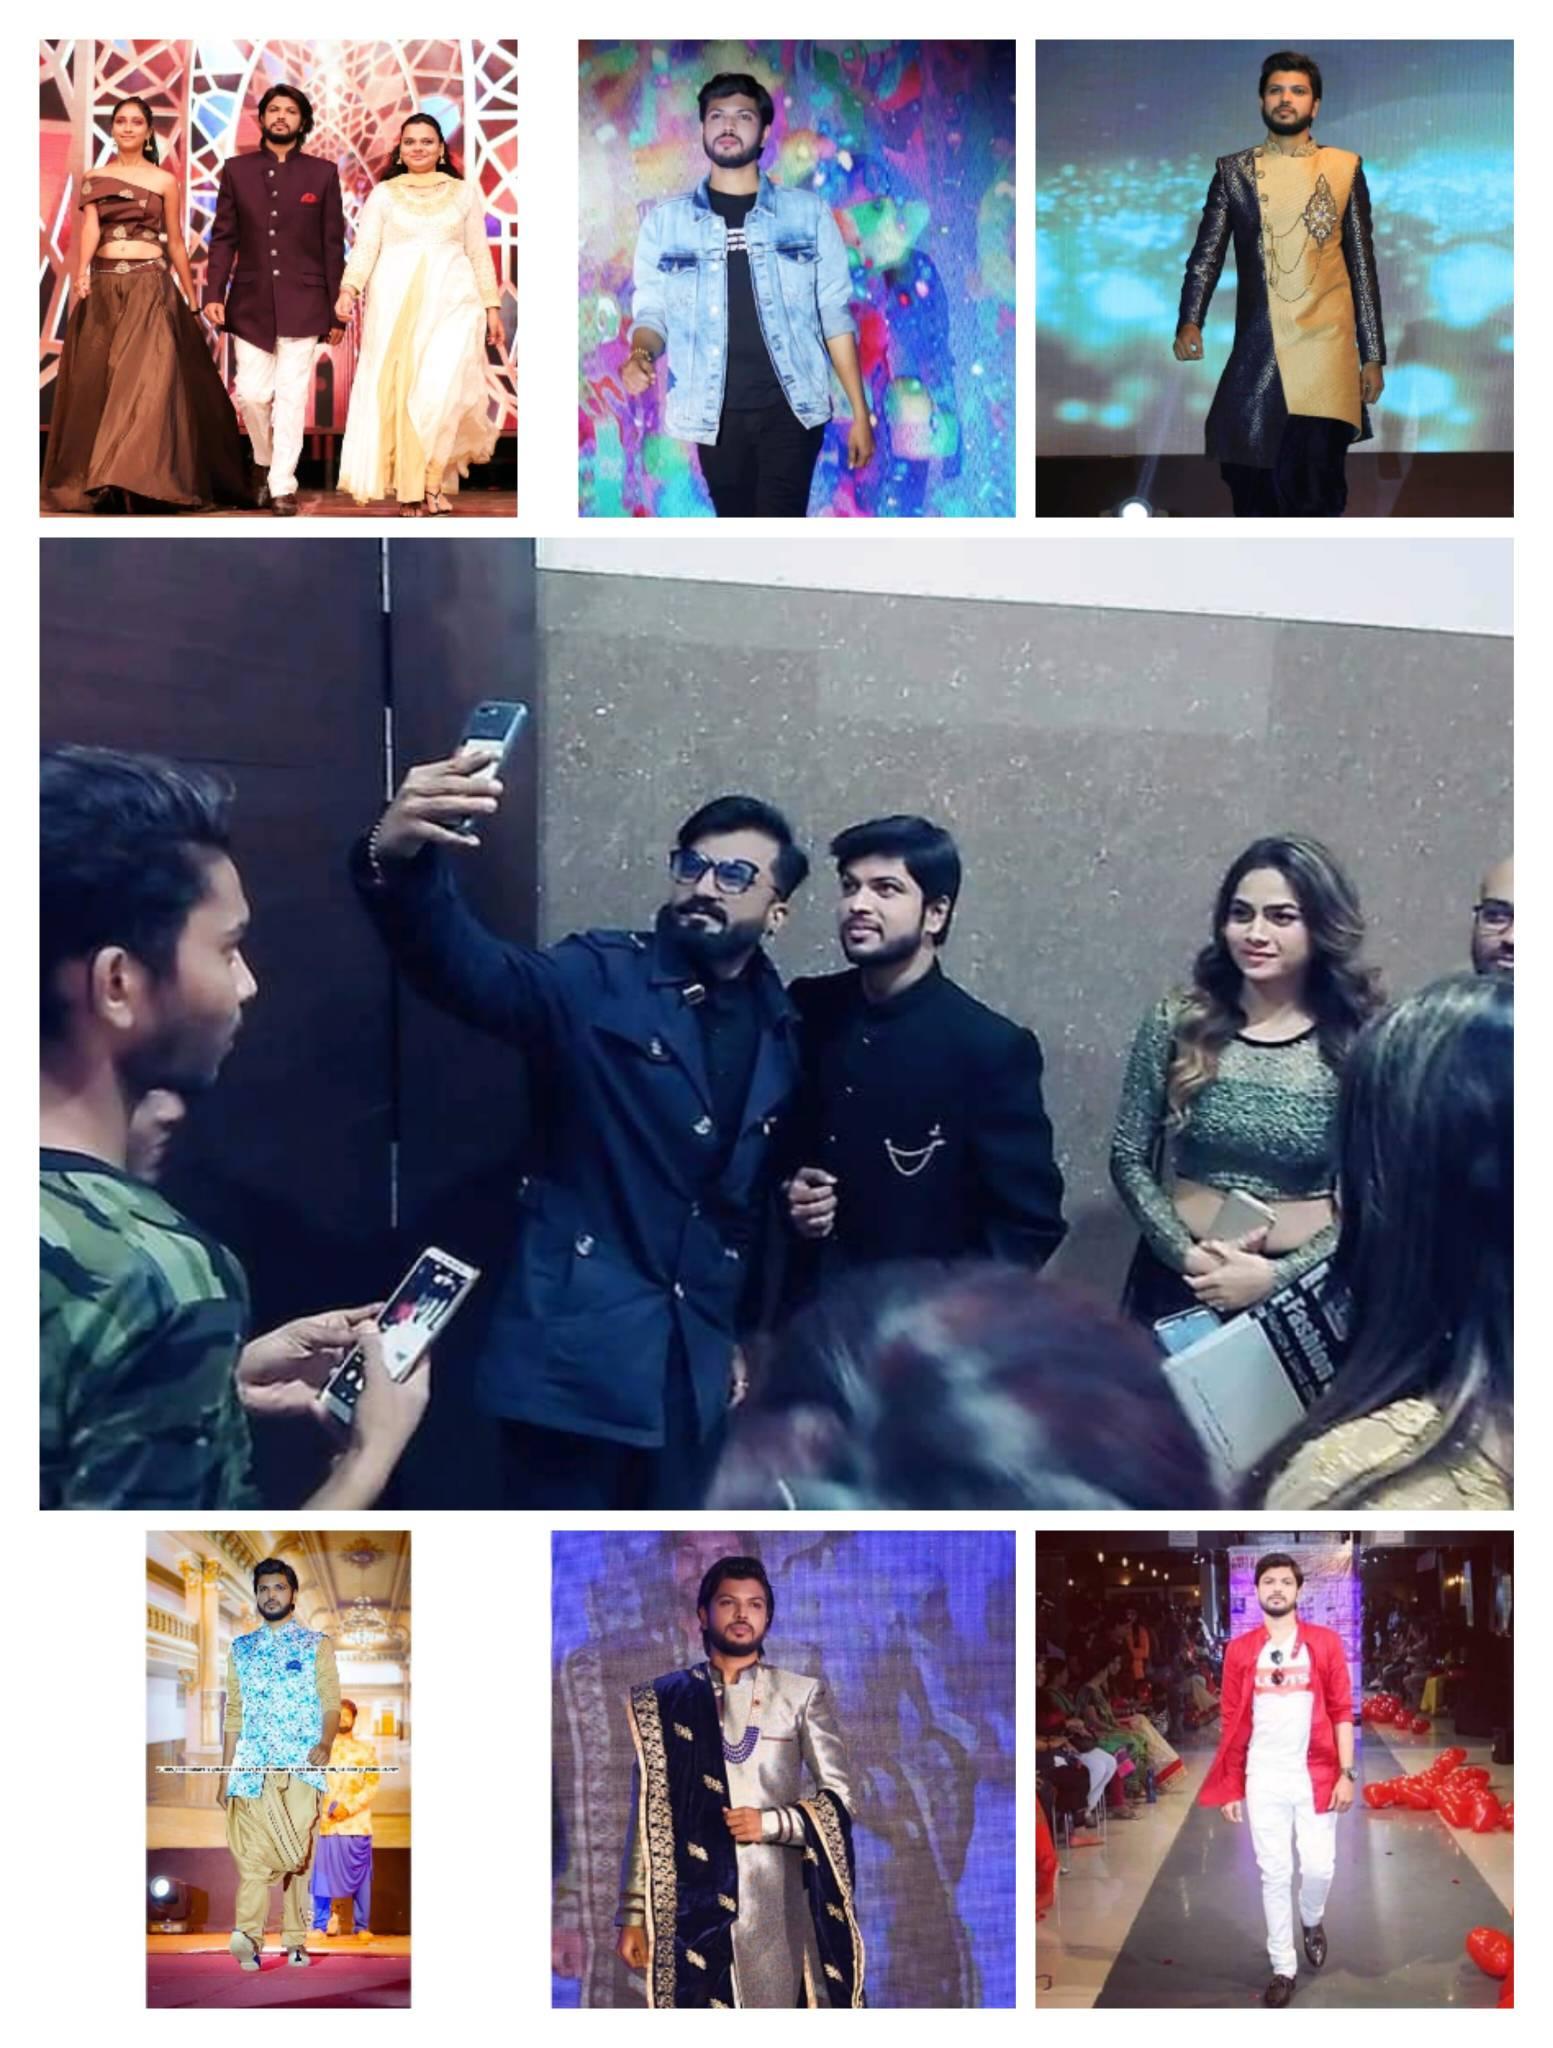 Satyyaa Patel Biography, Wiki, Birthday, Age, Height, Girlfriend, Family, Career, Instagram, Net Worth